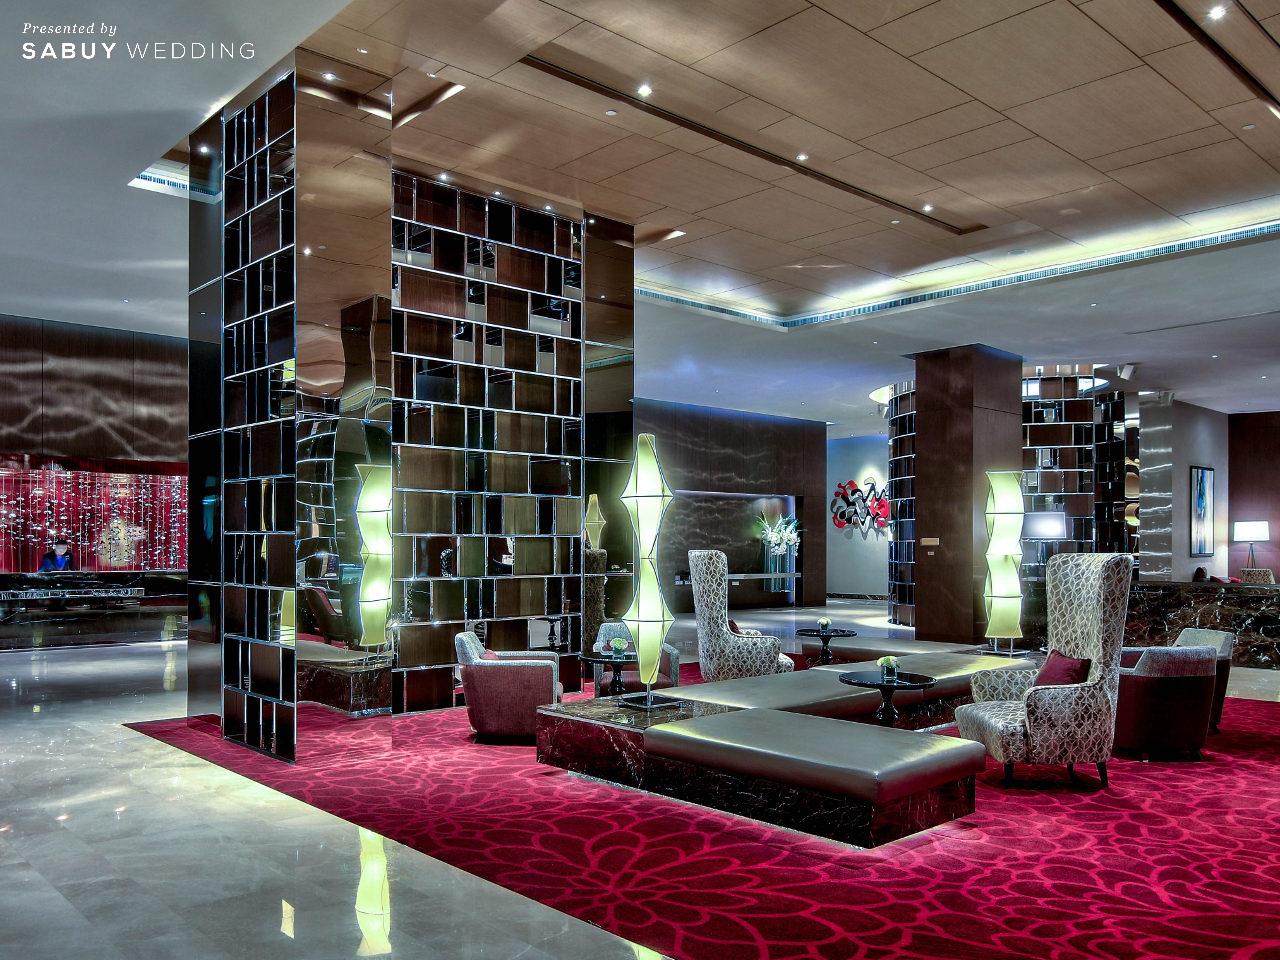 Radisson Blu Plaza Bangkok โรงแรมสุดหรู ใกล้รถไฟฟ้า จัดงานแต่งสบายในงบ 350K!